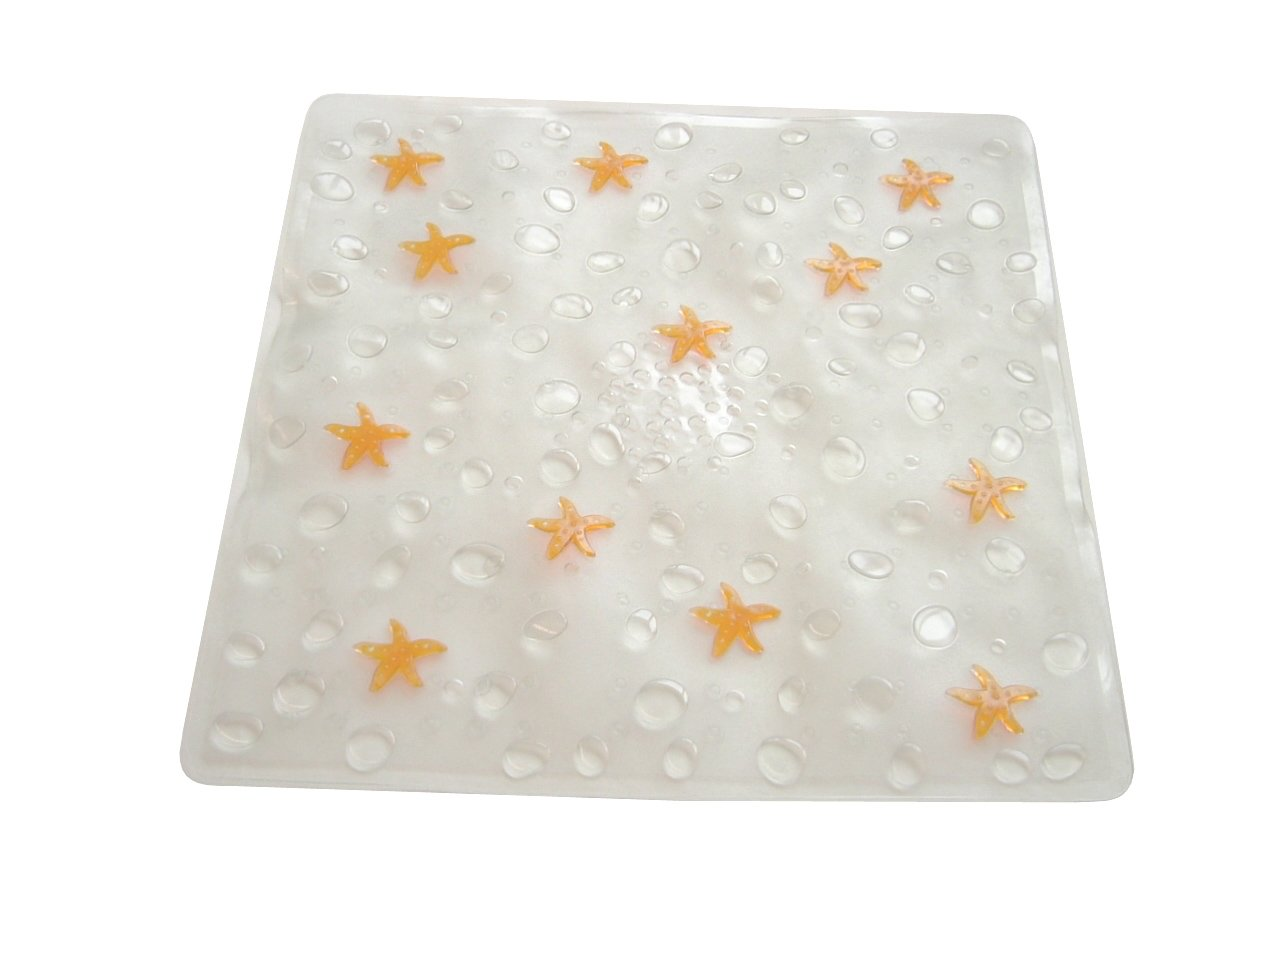 Dintex Estrella – Alfombra Antideslizante para Ducha, 55 x 55 cm, Color Naranja